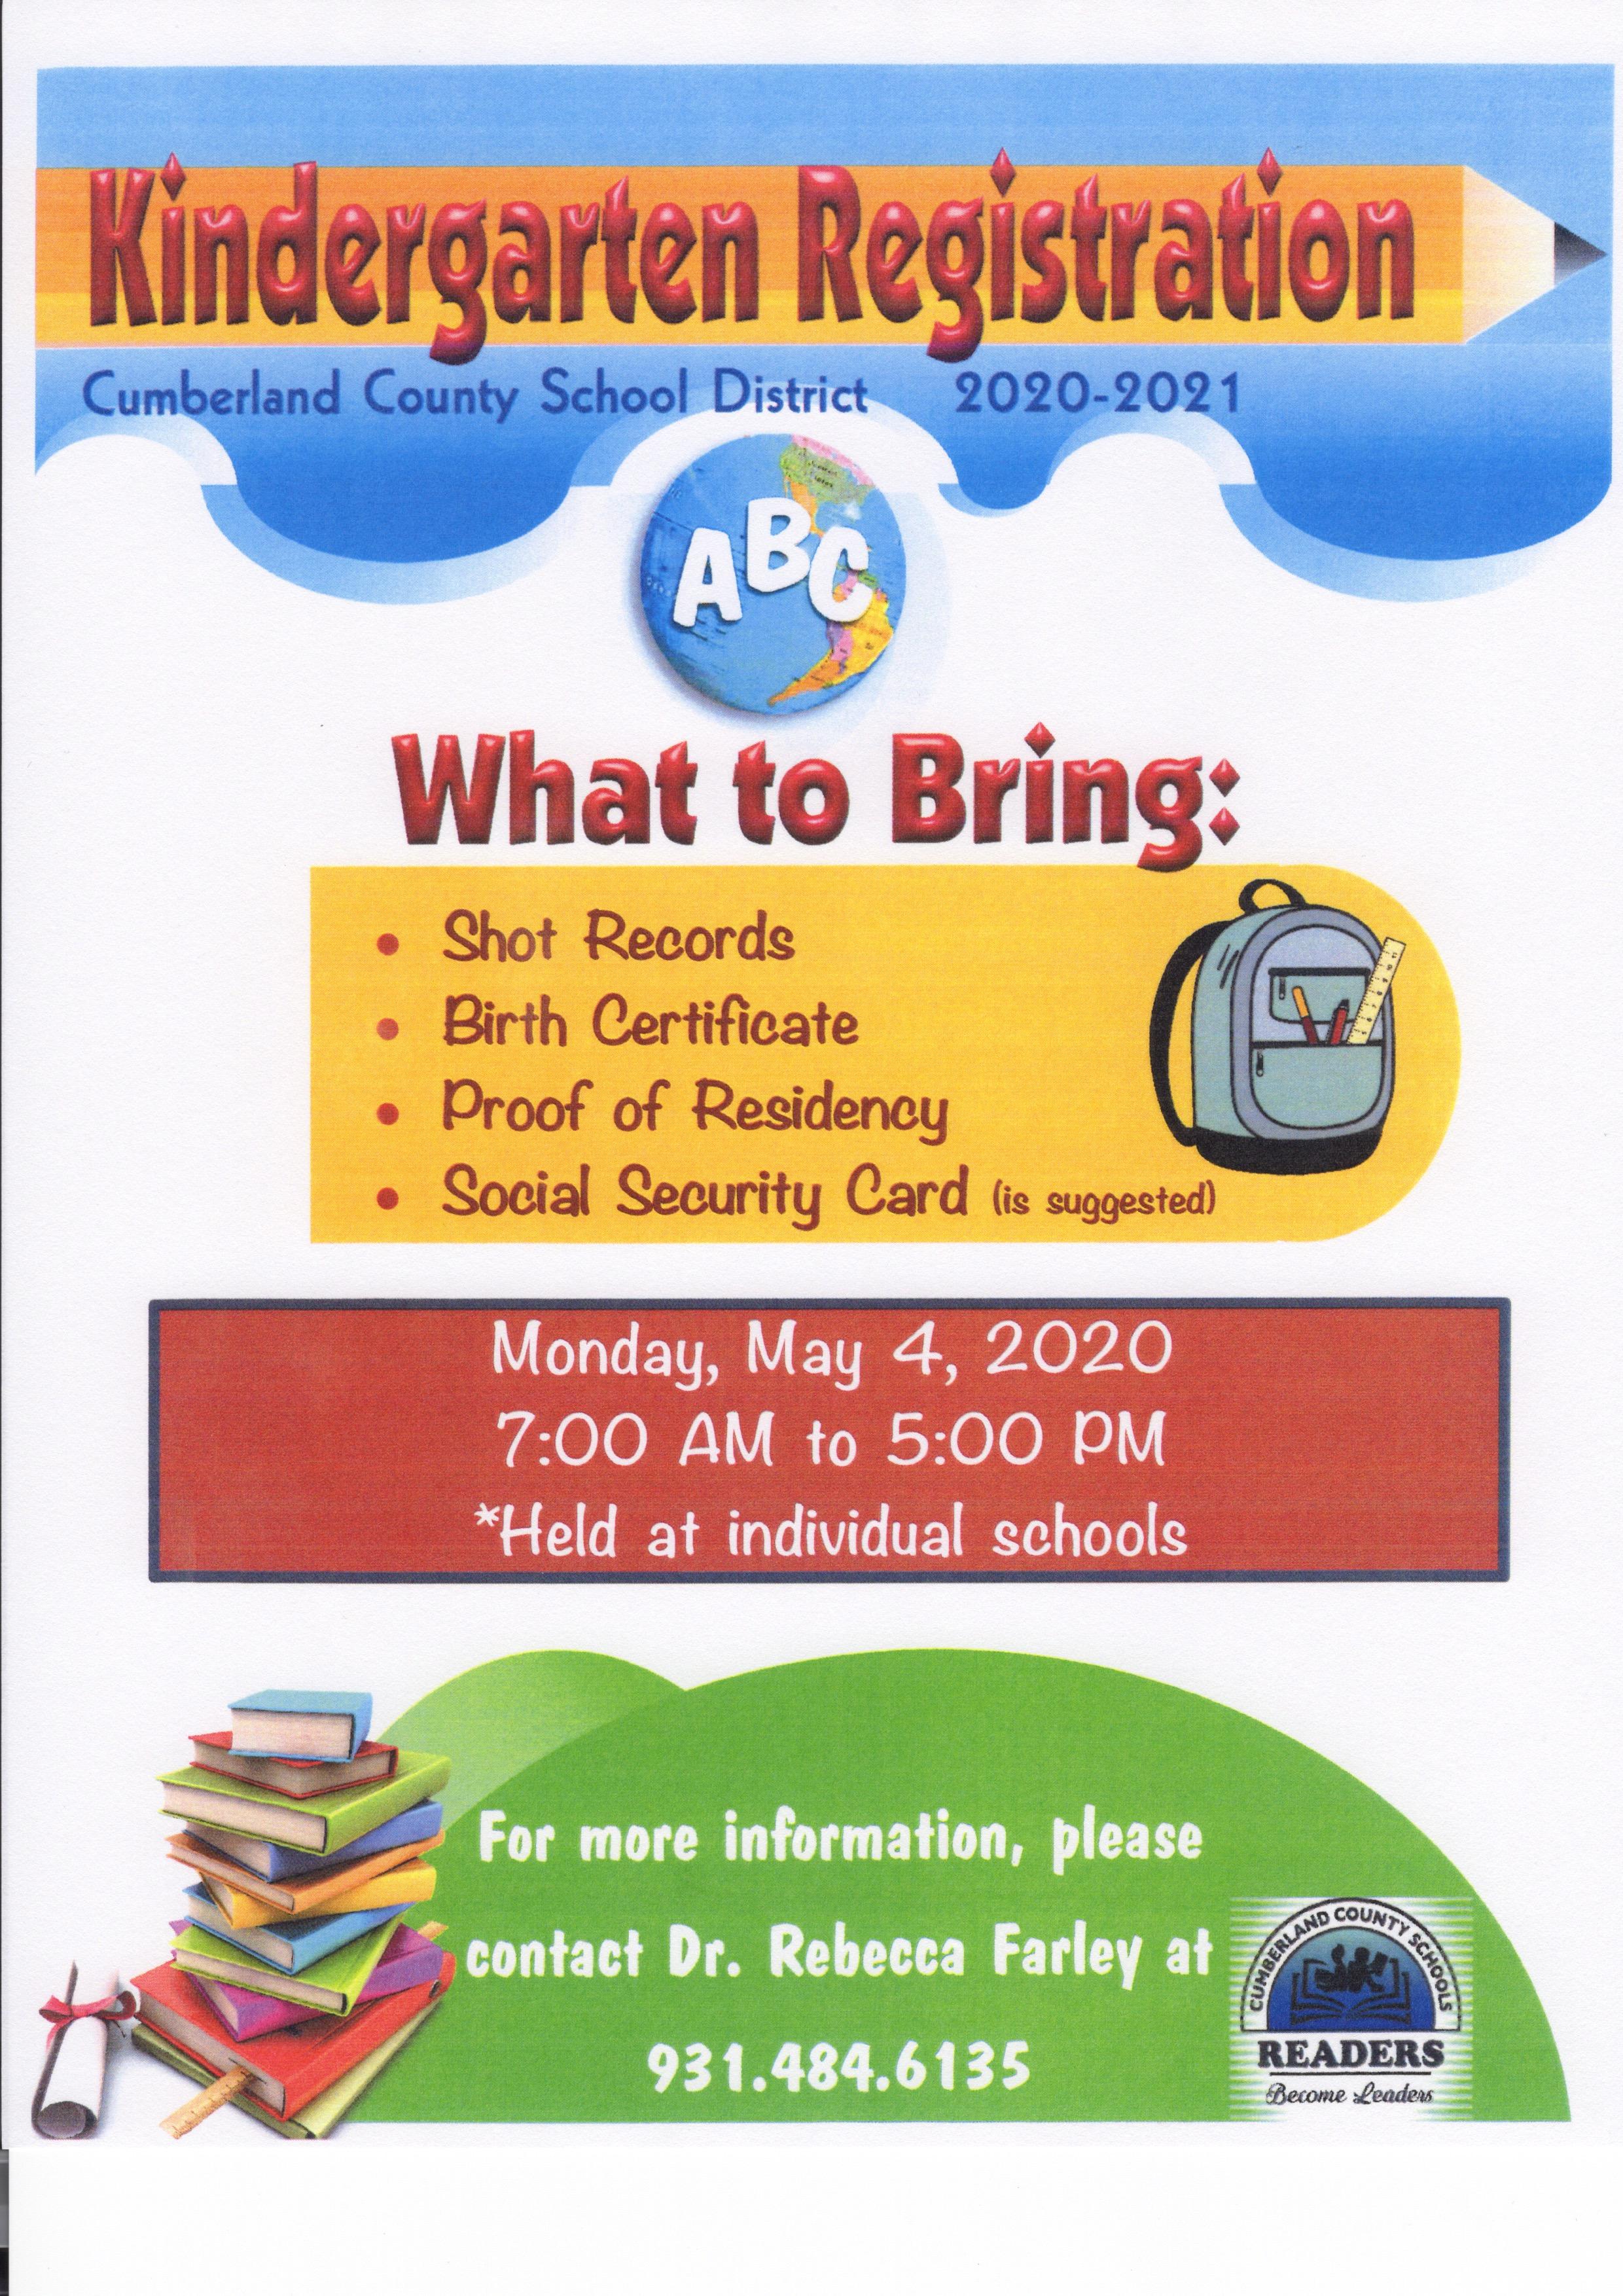 flyer for Kindergarten Registration starting May 4th